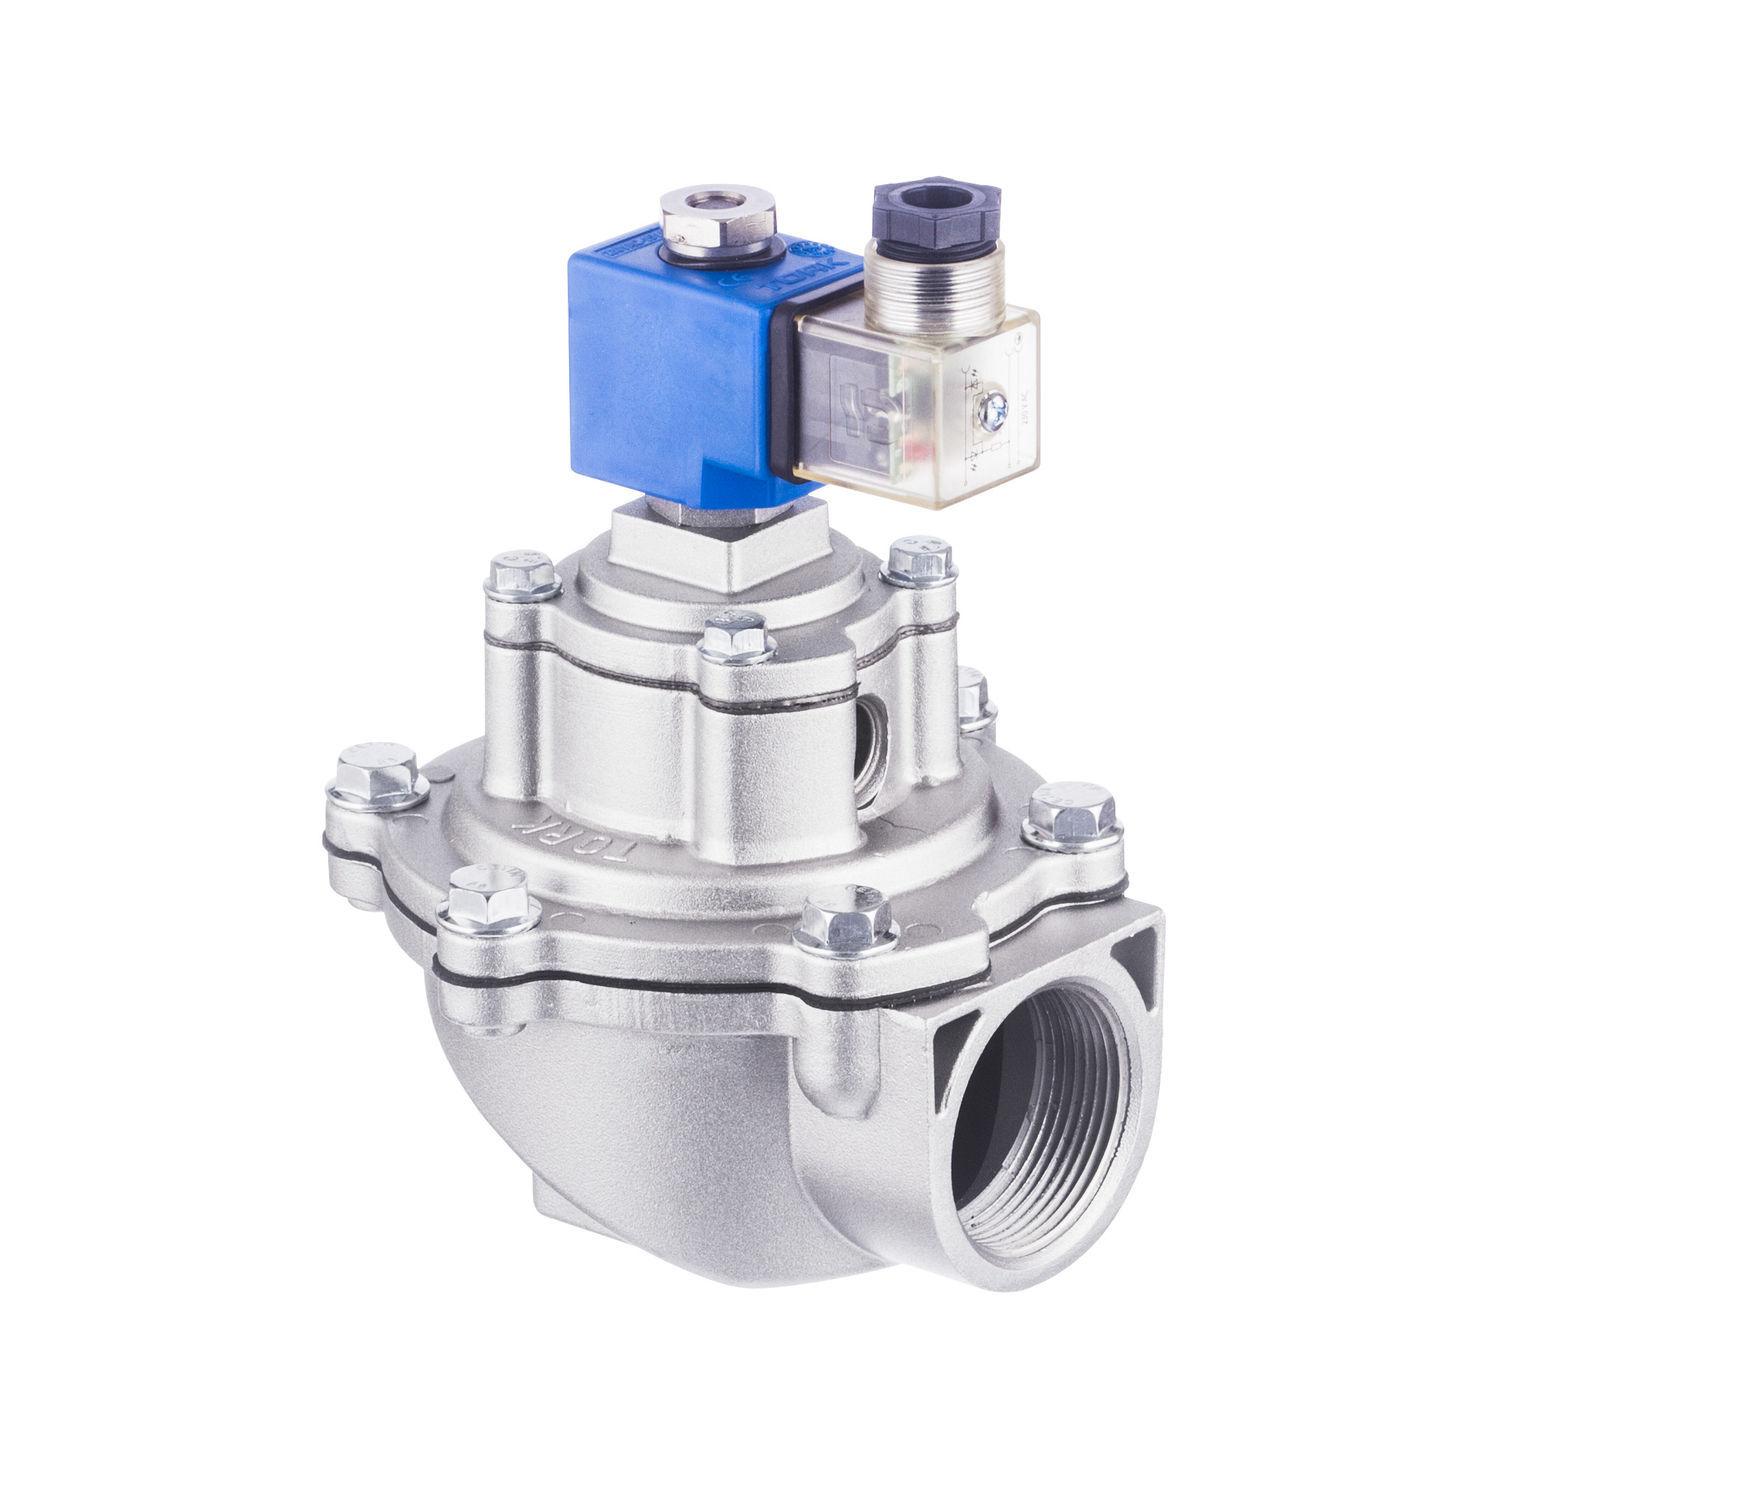 Membrane solenoid valve / single-channel / hydraulic